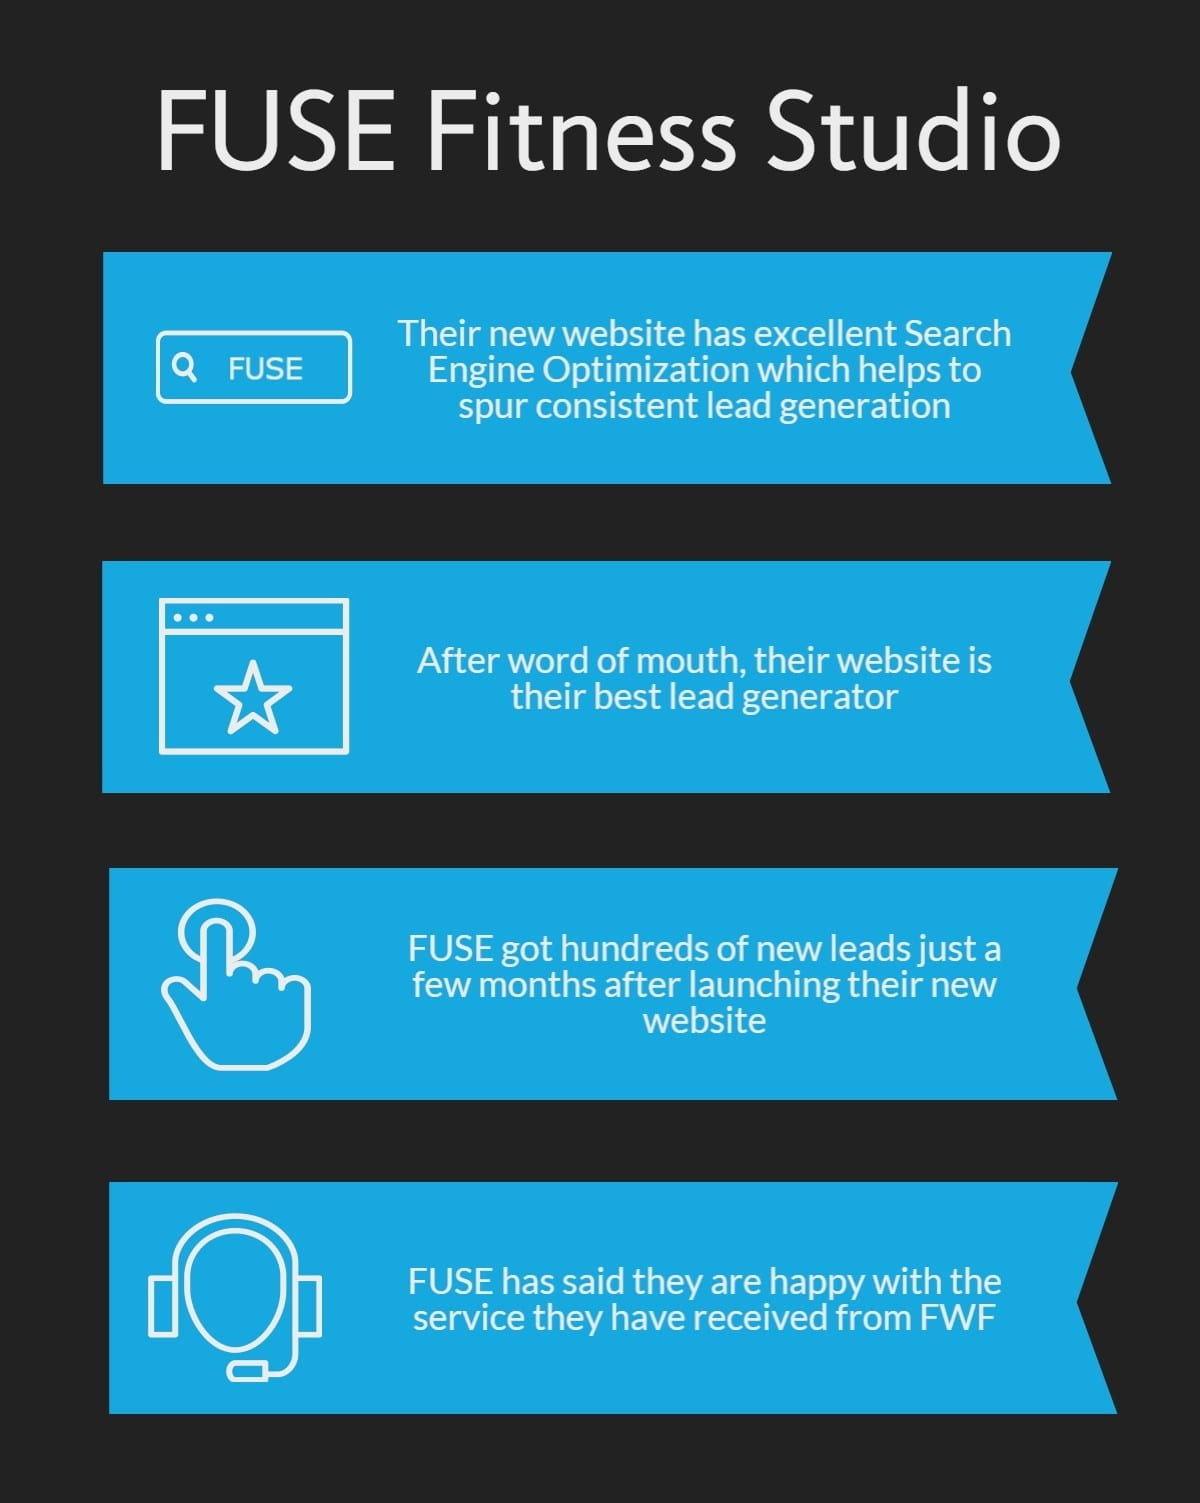 Case Study: Fuse Fitness Studio - Fitness Web Design